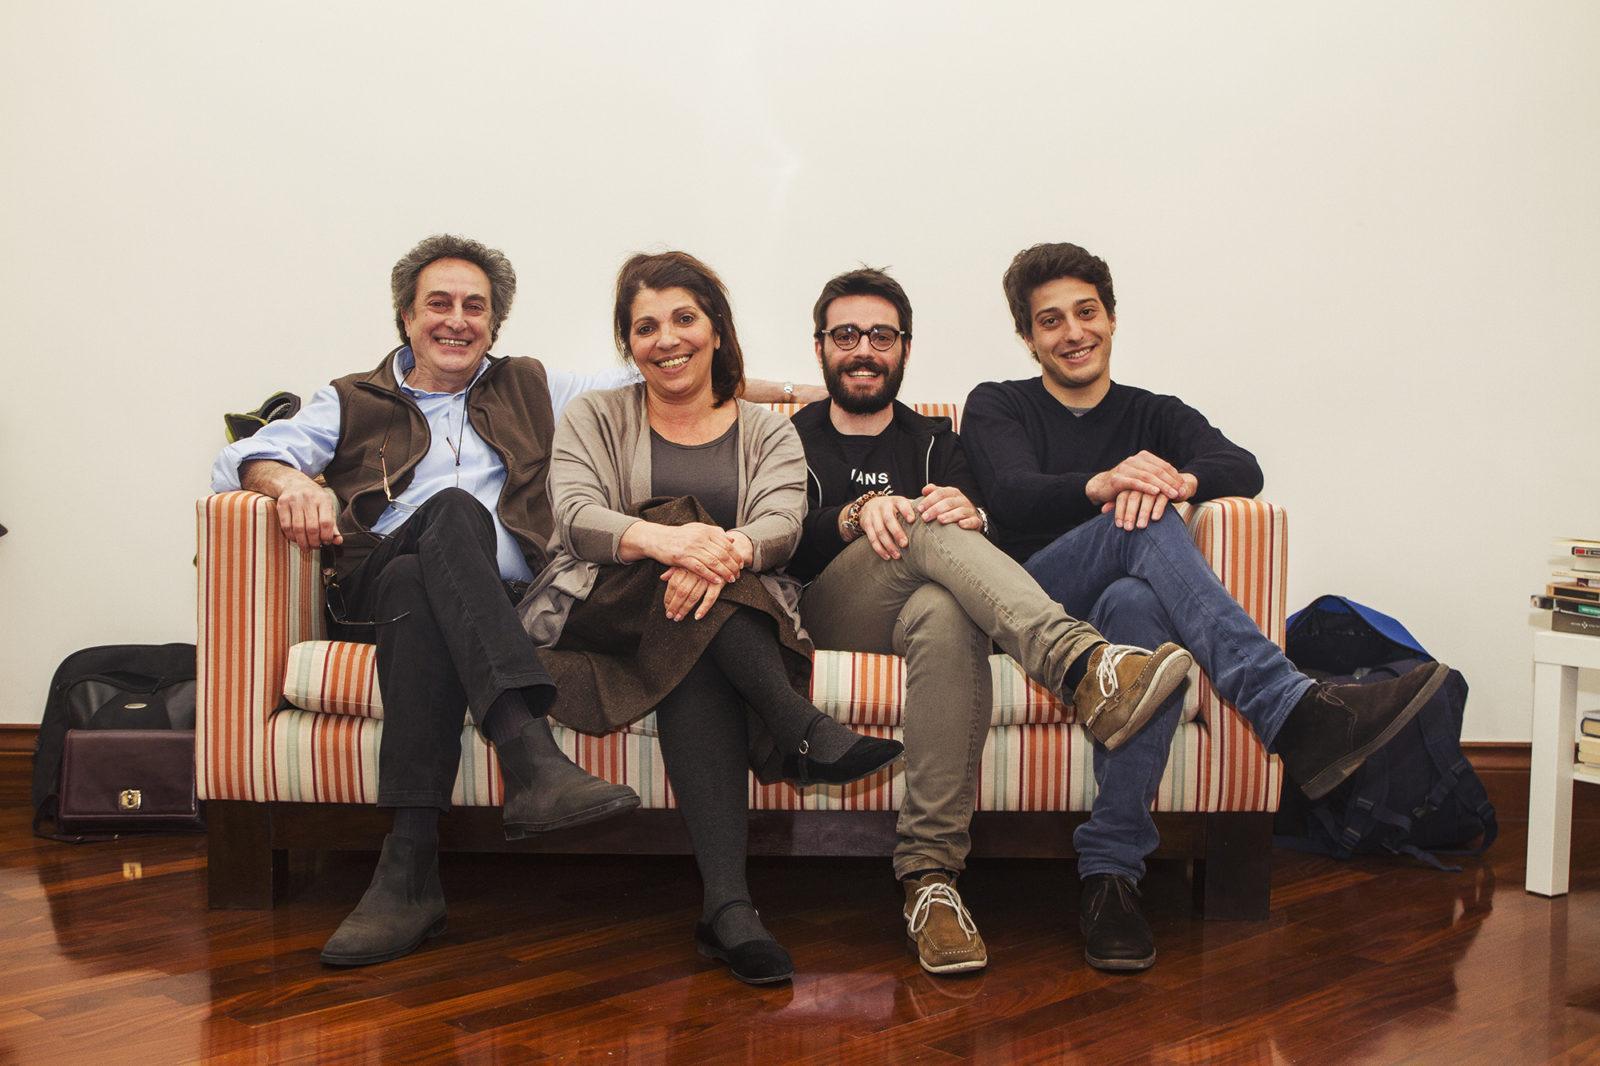 Angelo Tosto, Lucia Sardo,  Michele Leonardi, Giorgio Musumeci